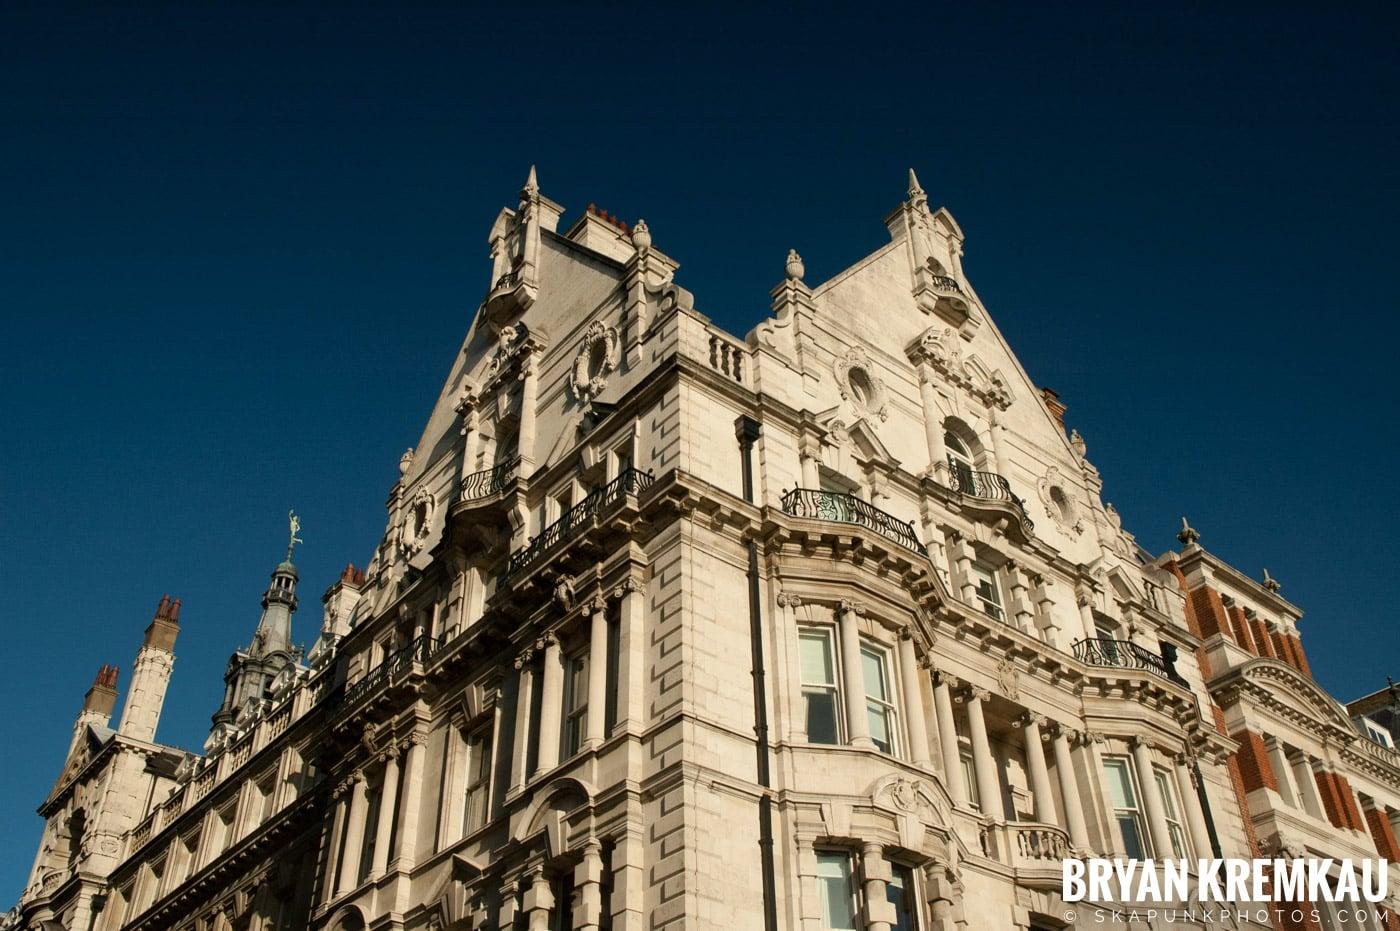 London, England - Day 2 - 12.9.06 (15)